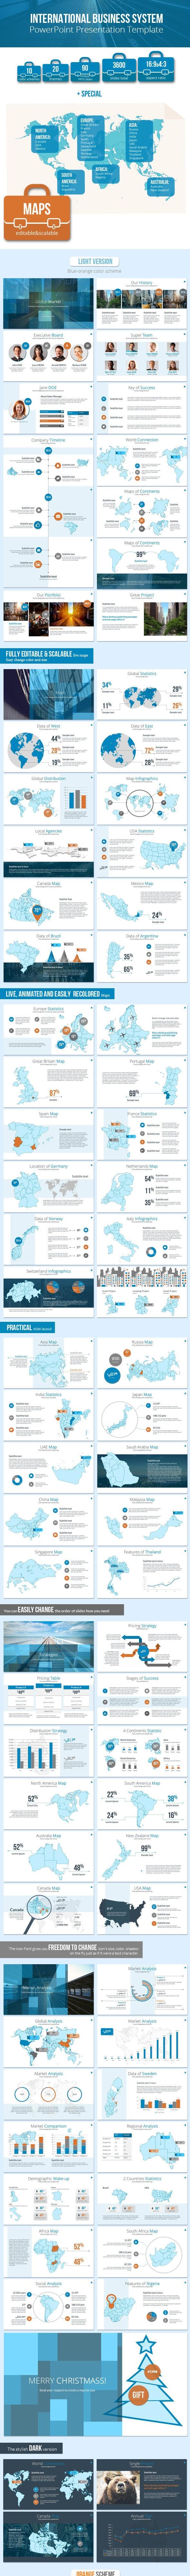 International Business System Presentation - Business PowerPoint Templates